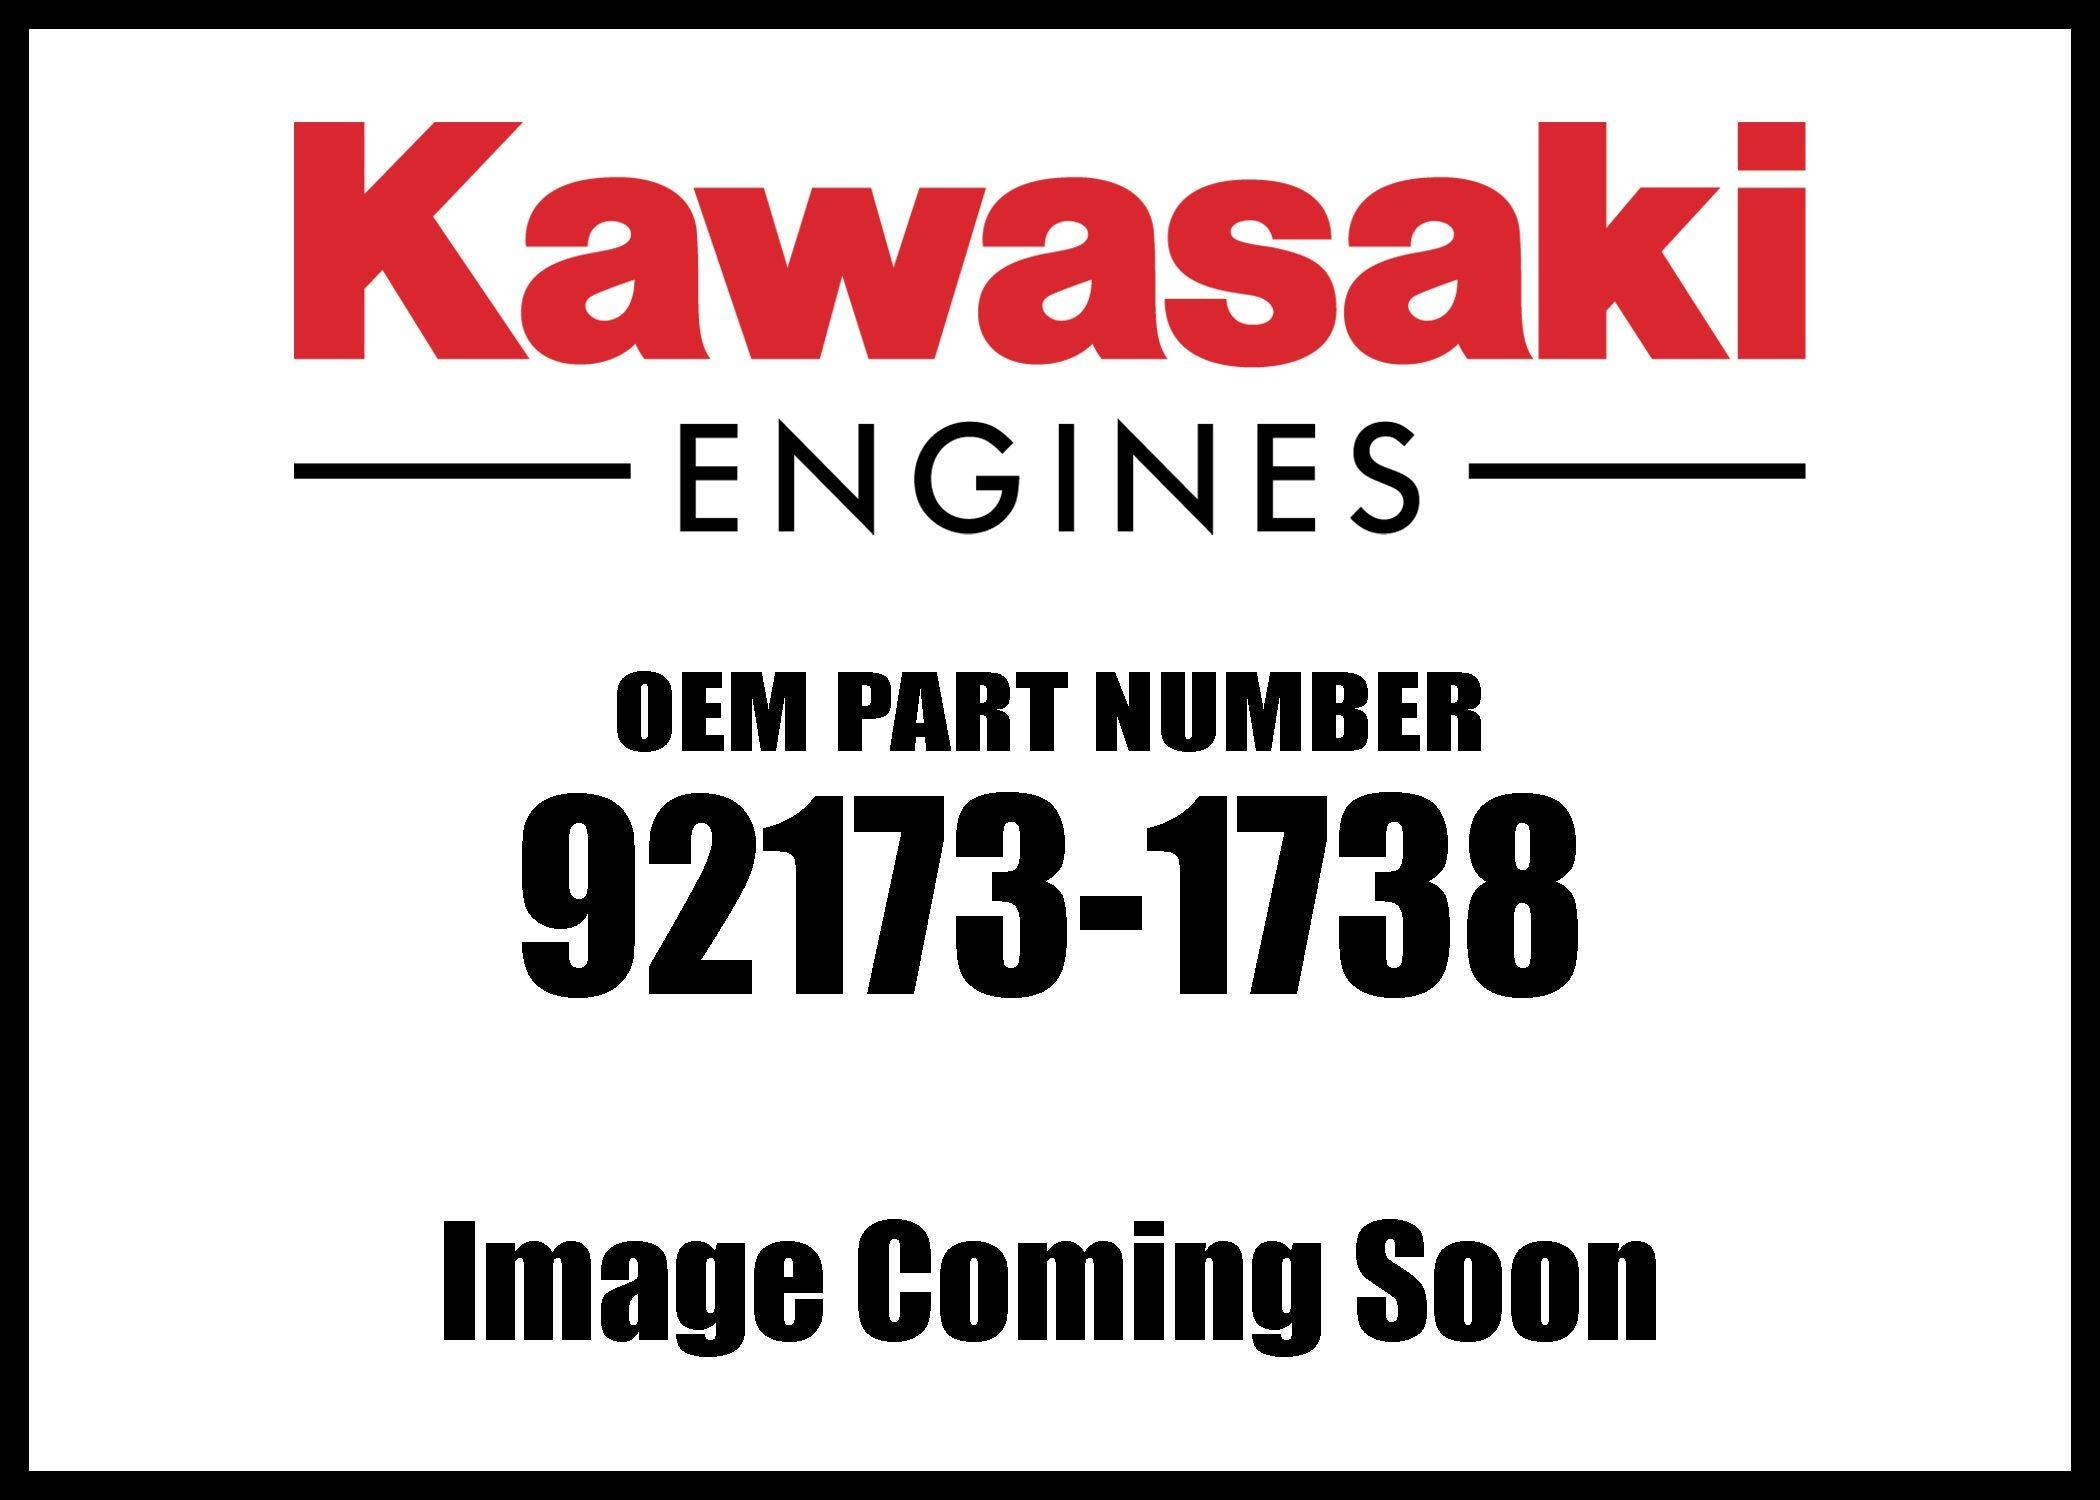 Kawasaki Engine Clamp 92173-1738 New OEM